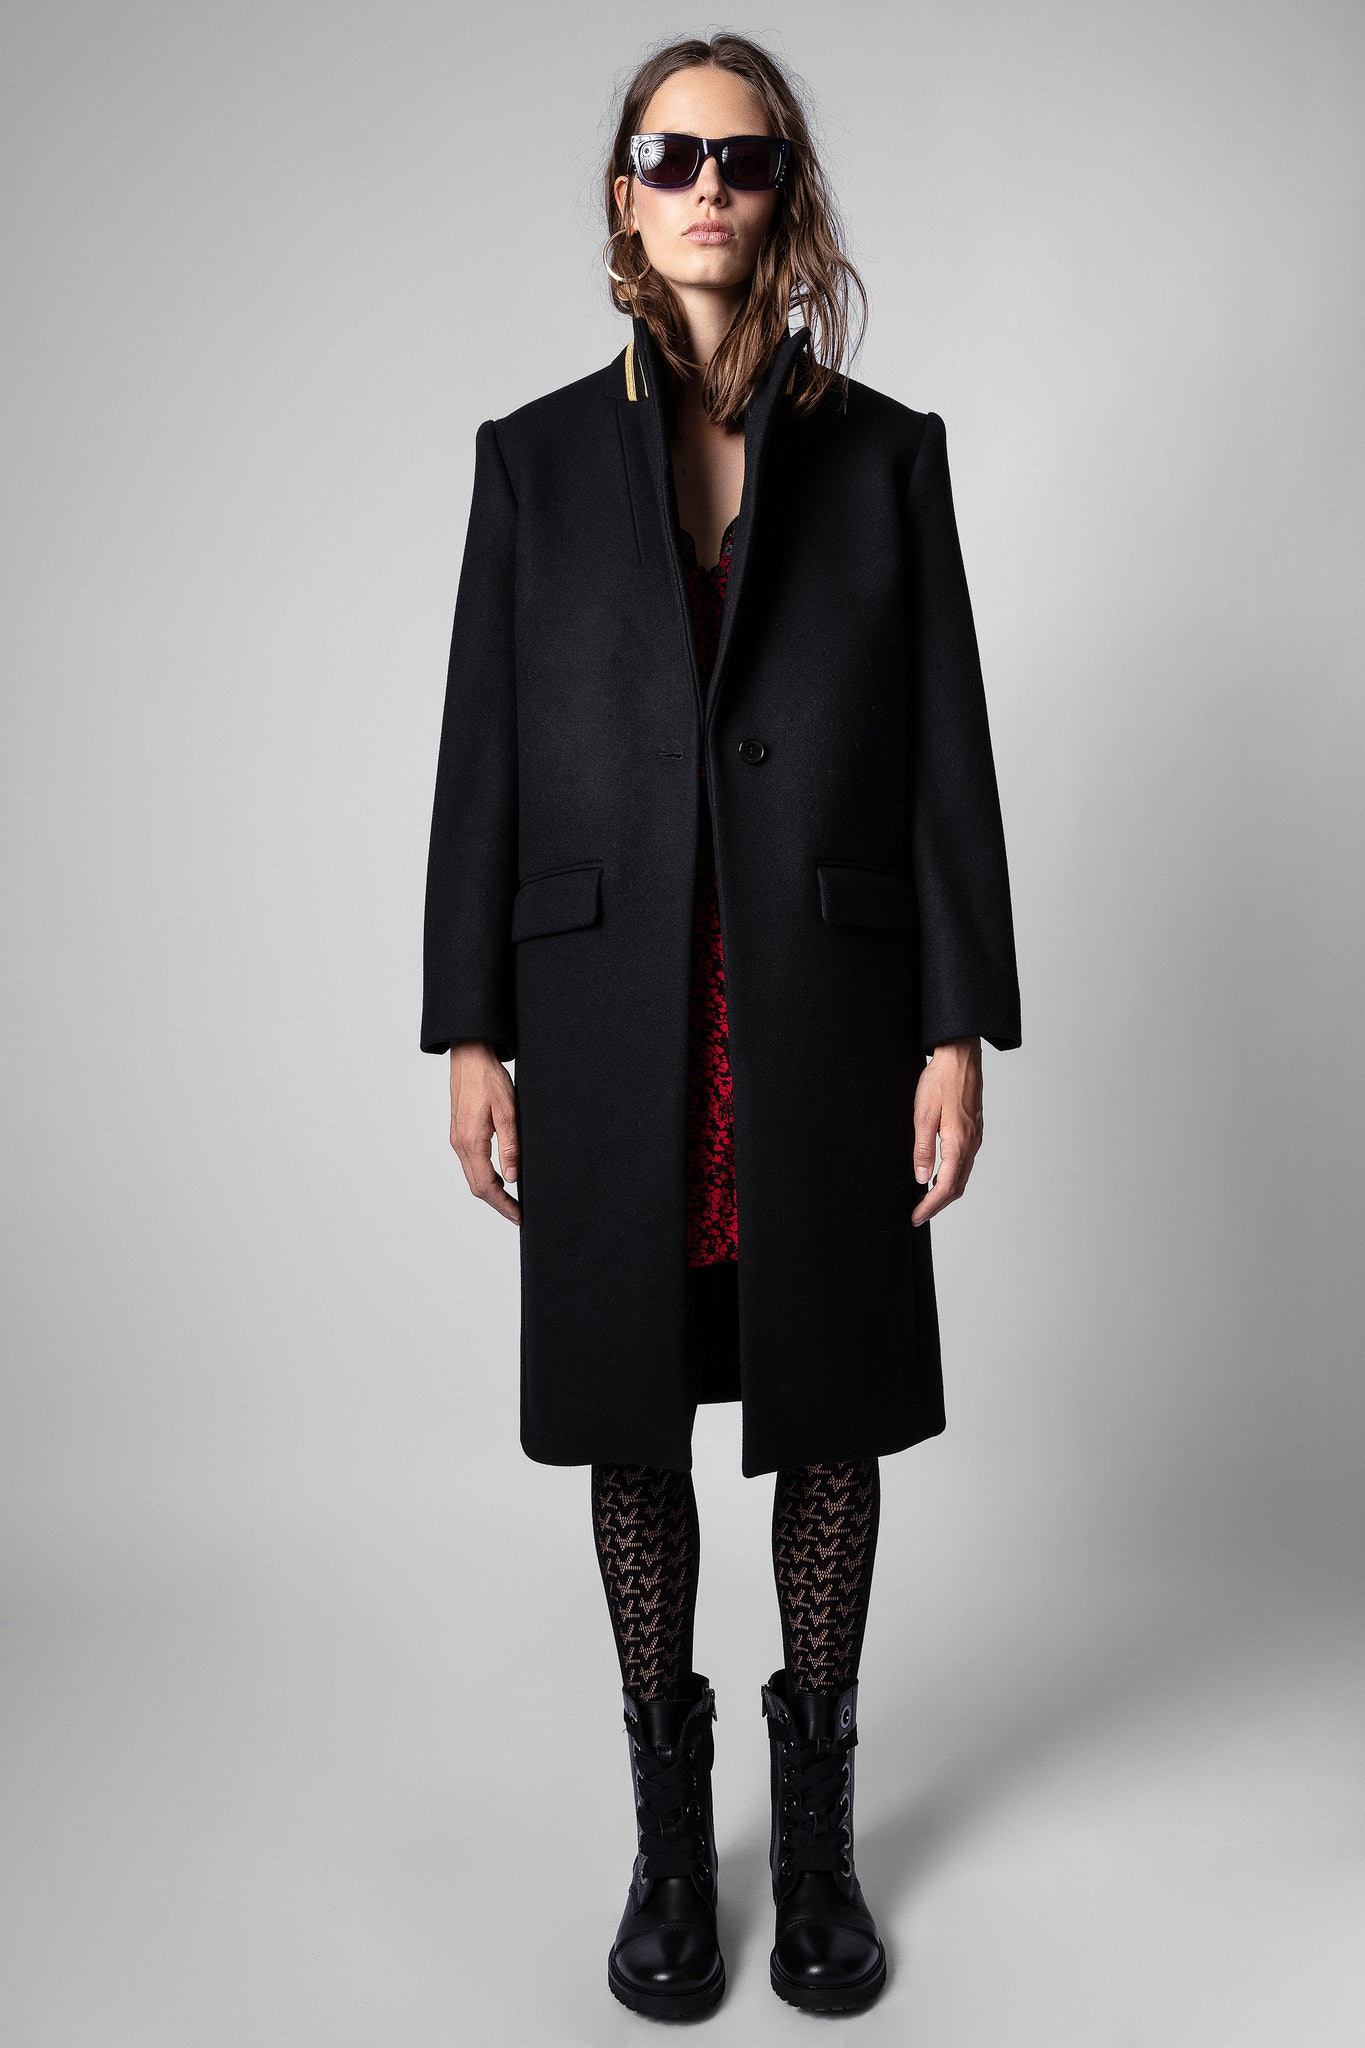 Monarque Coat